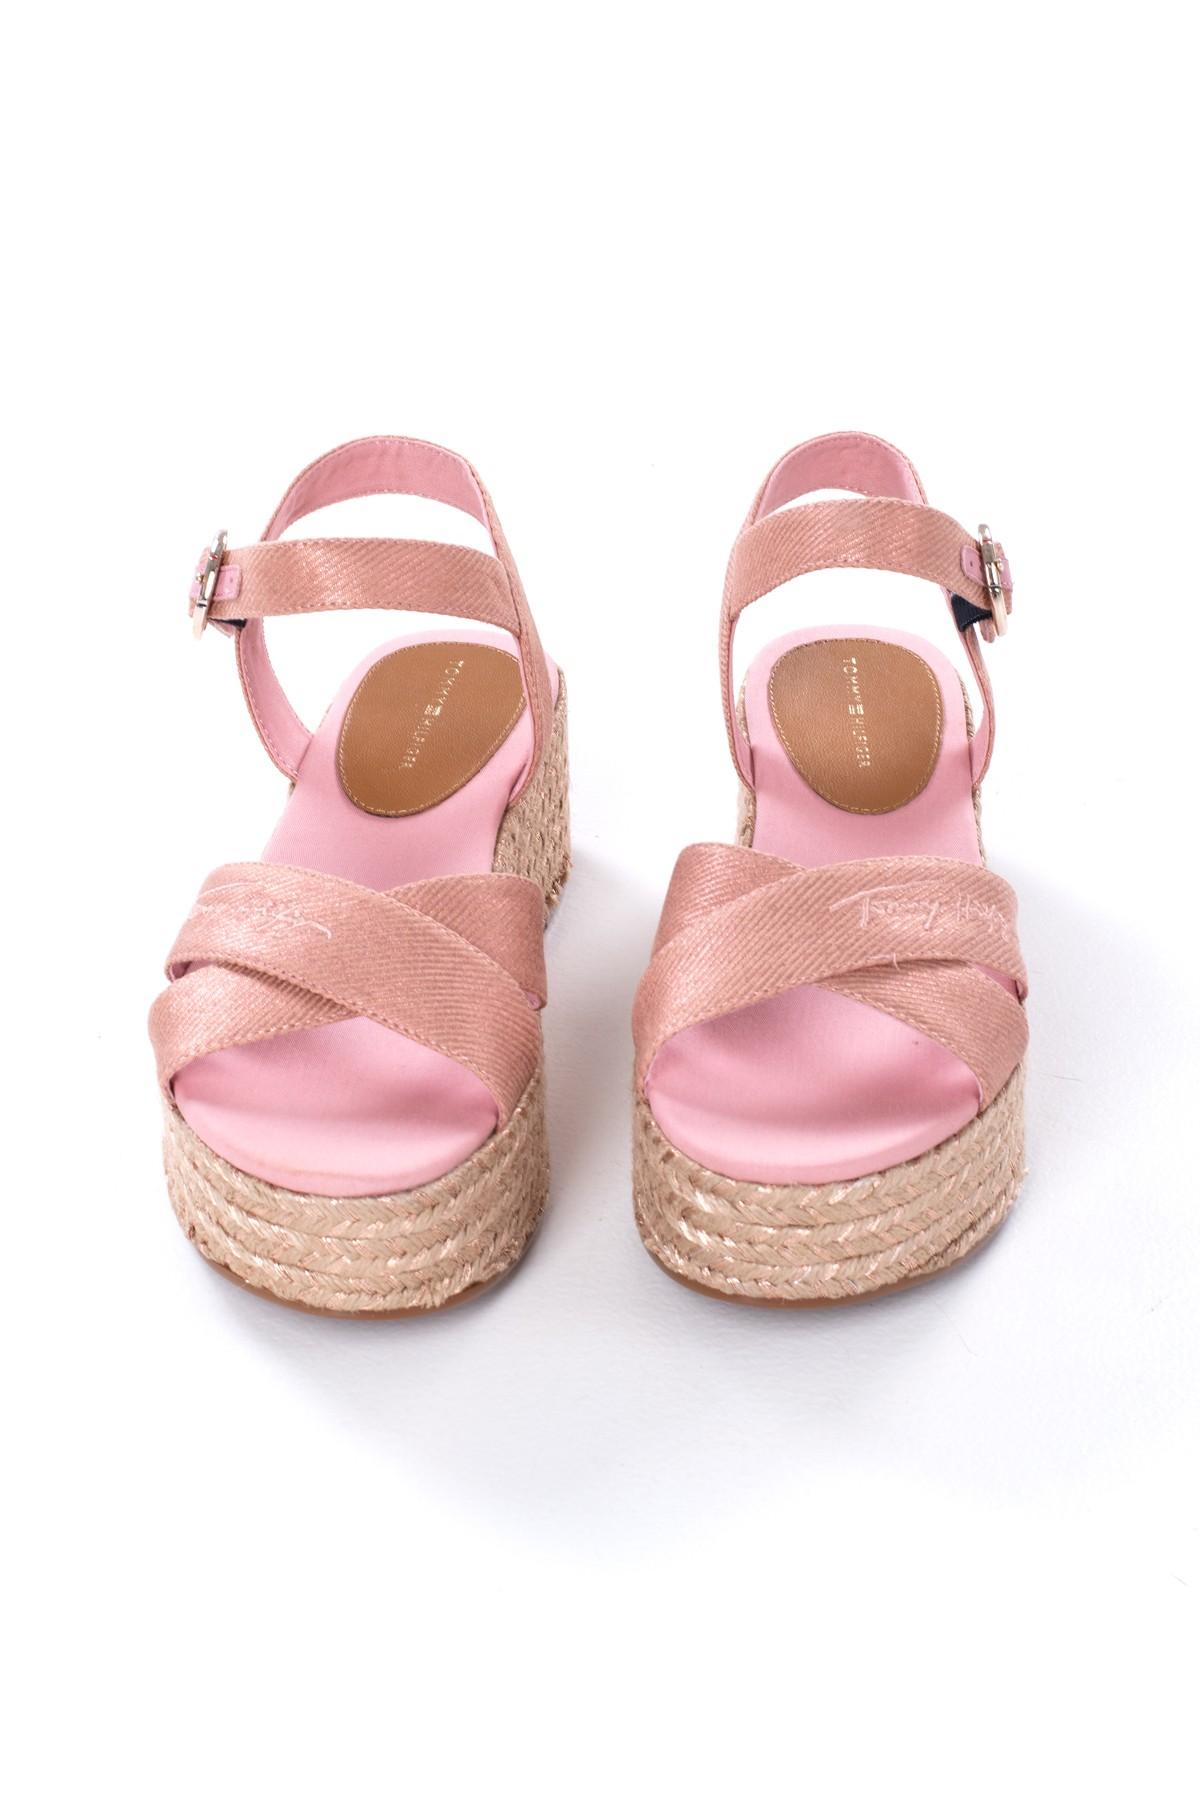 Platform shoes TH SIGNATURE FLATFORM SANDAL-full-2